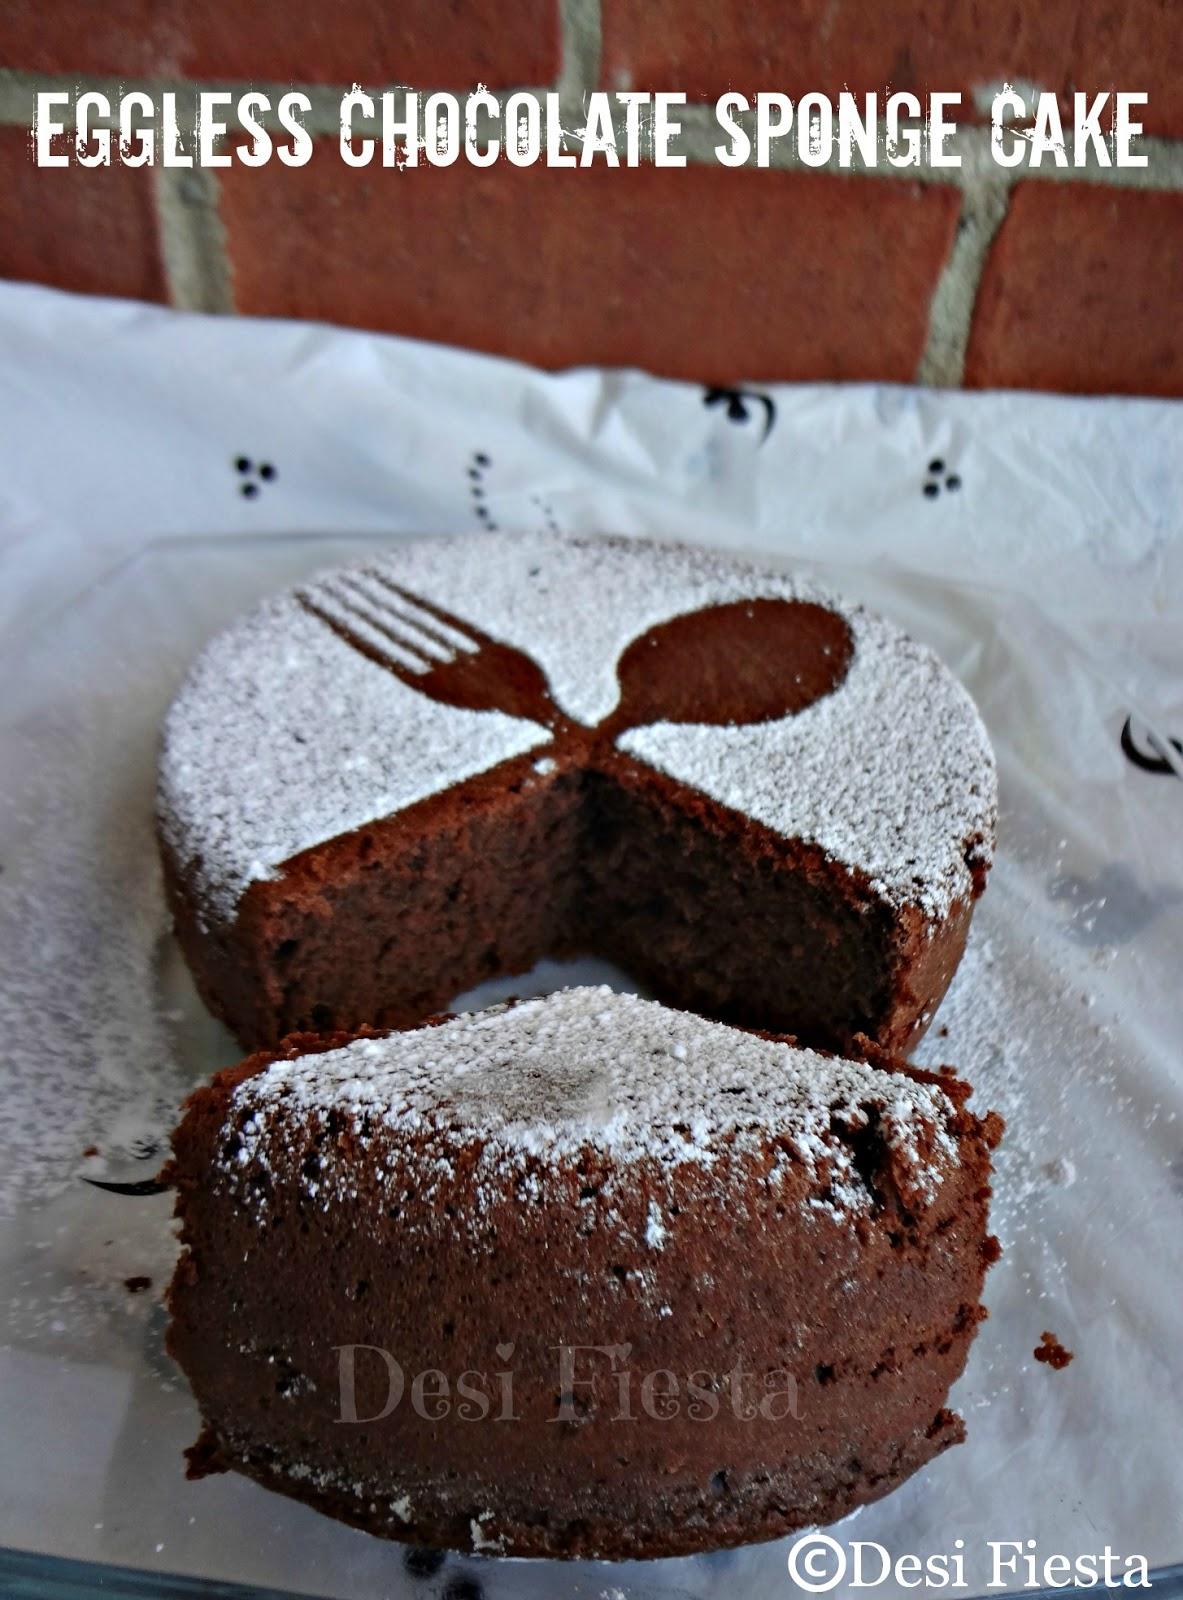 Eggless Chocolate Sponge Cake Desi Fiesta